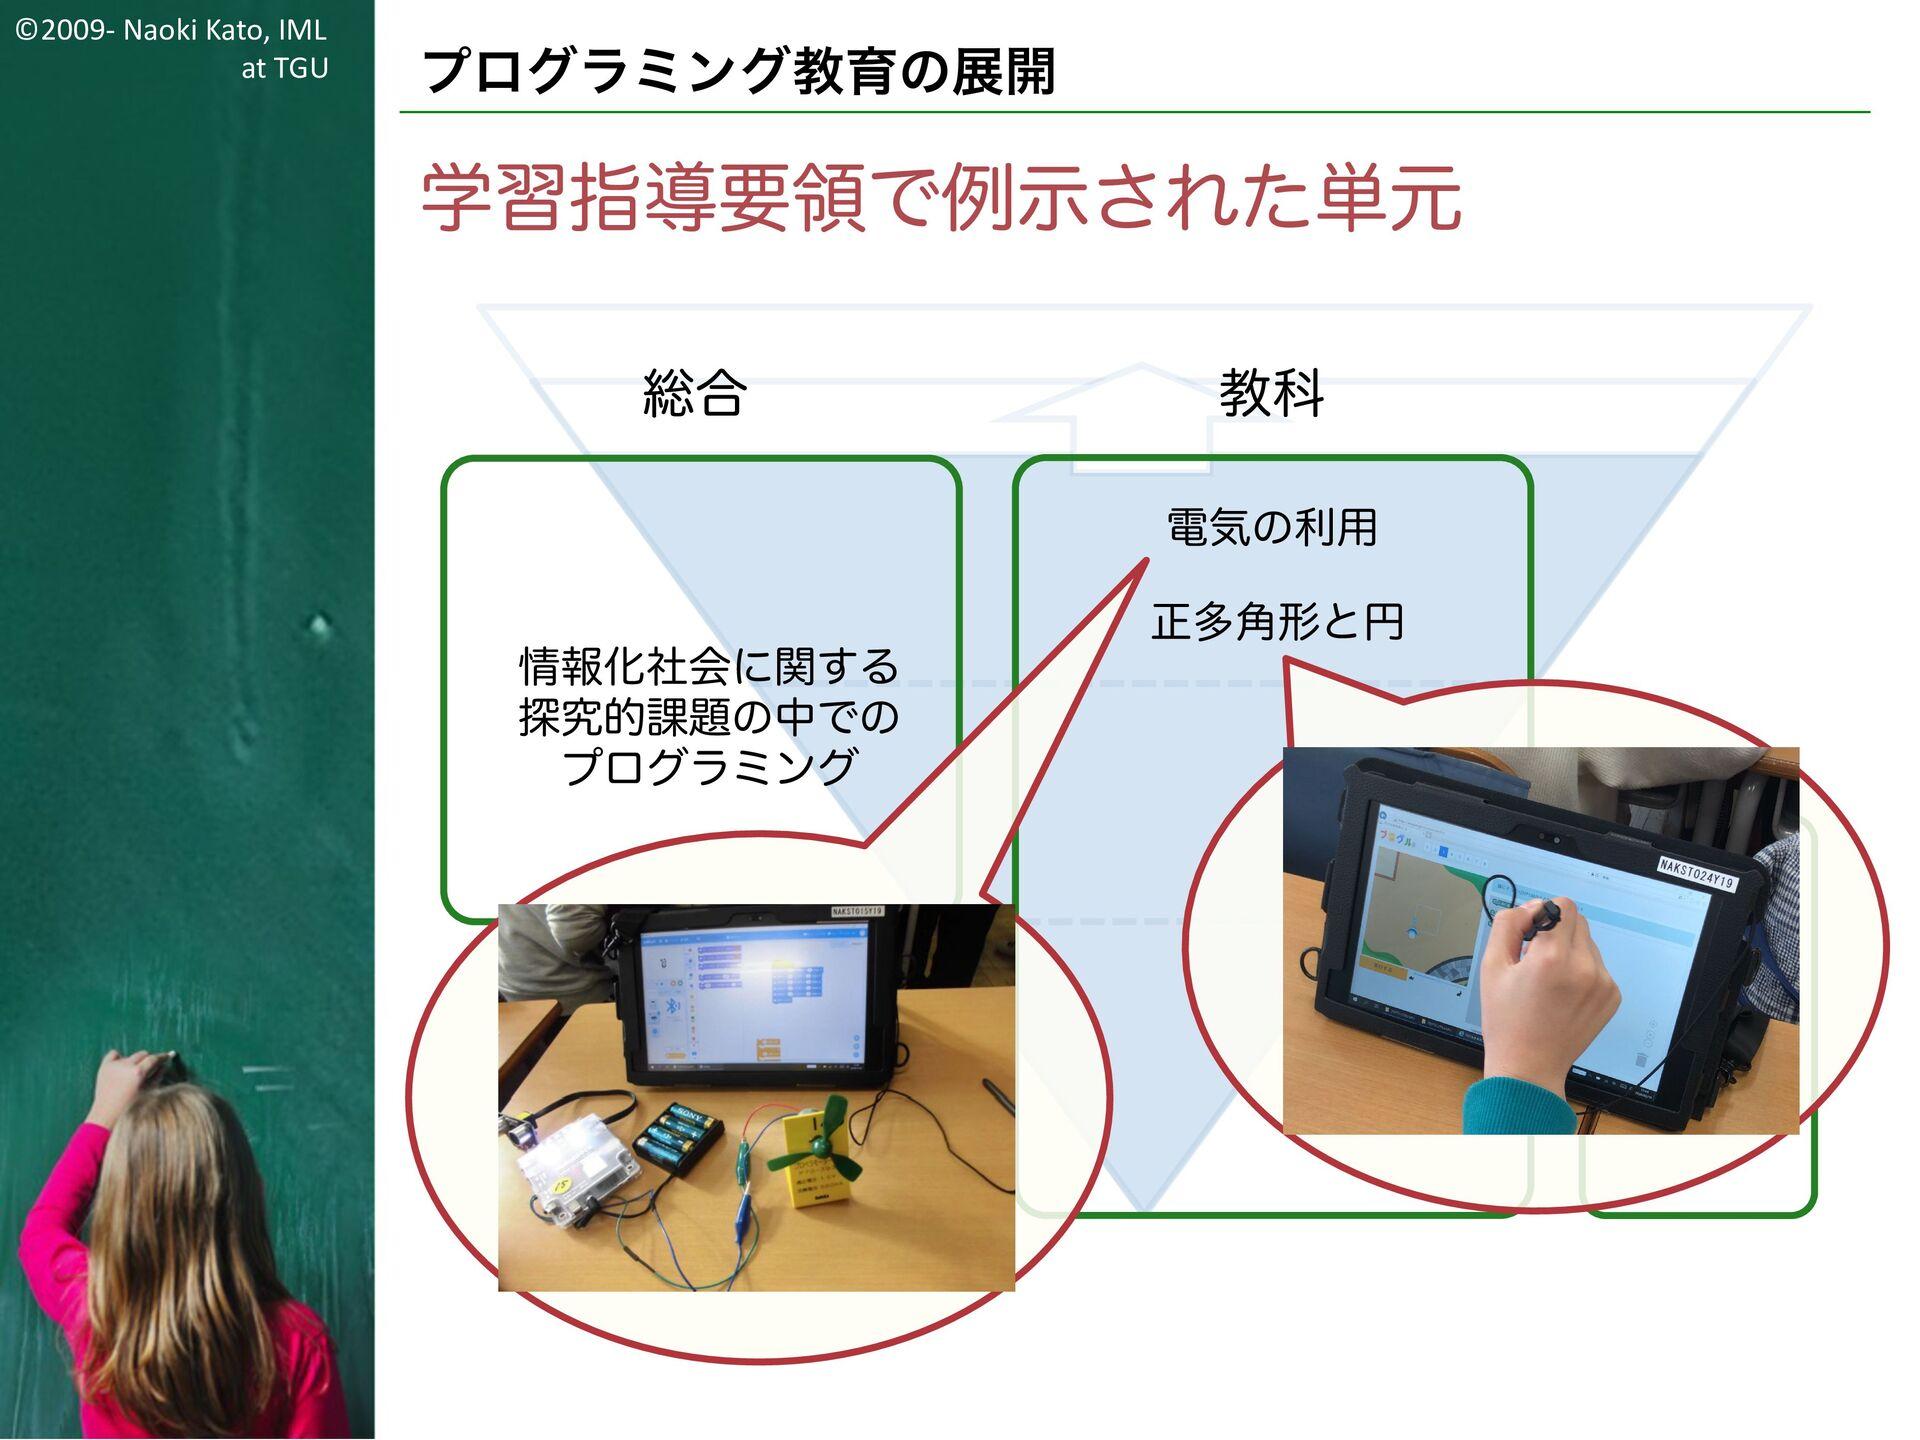 ©2009- Naoki Kato, IML at TGU プログラミング教育の展開 それには...